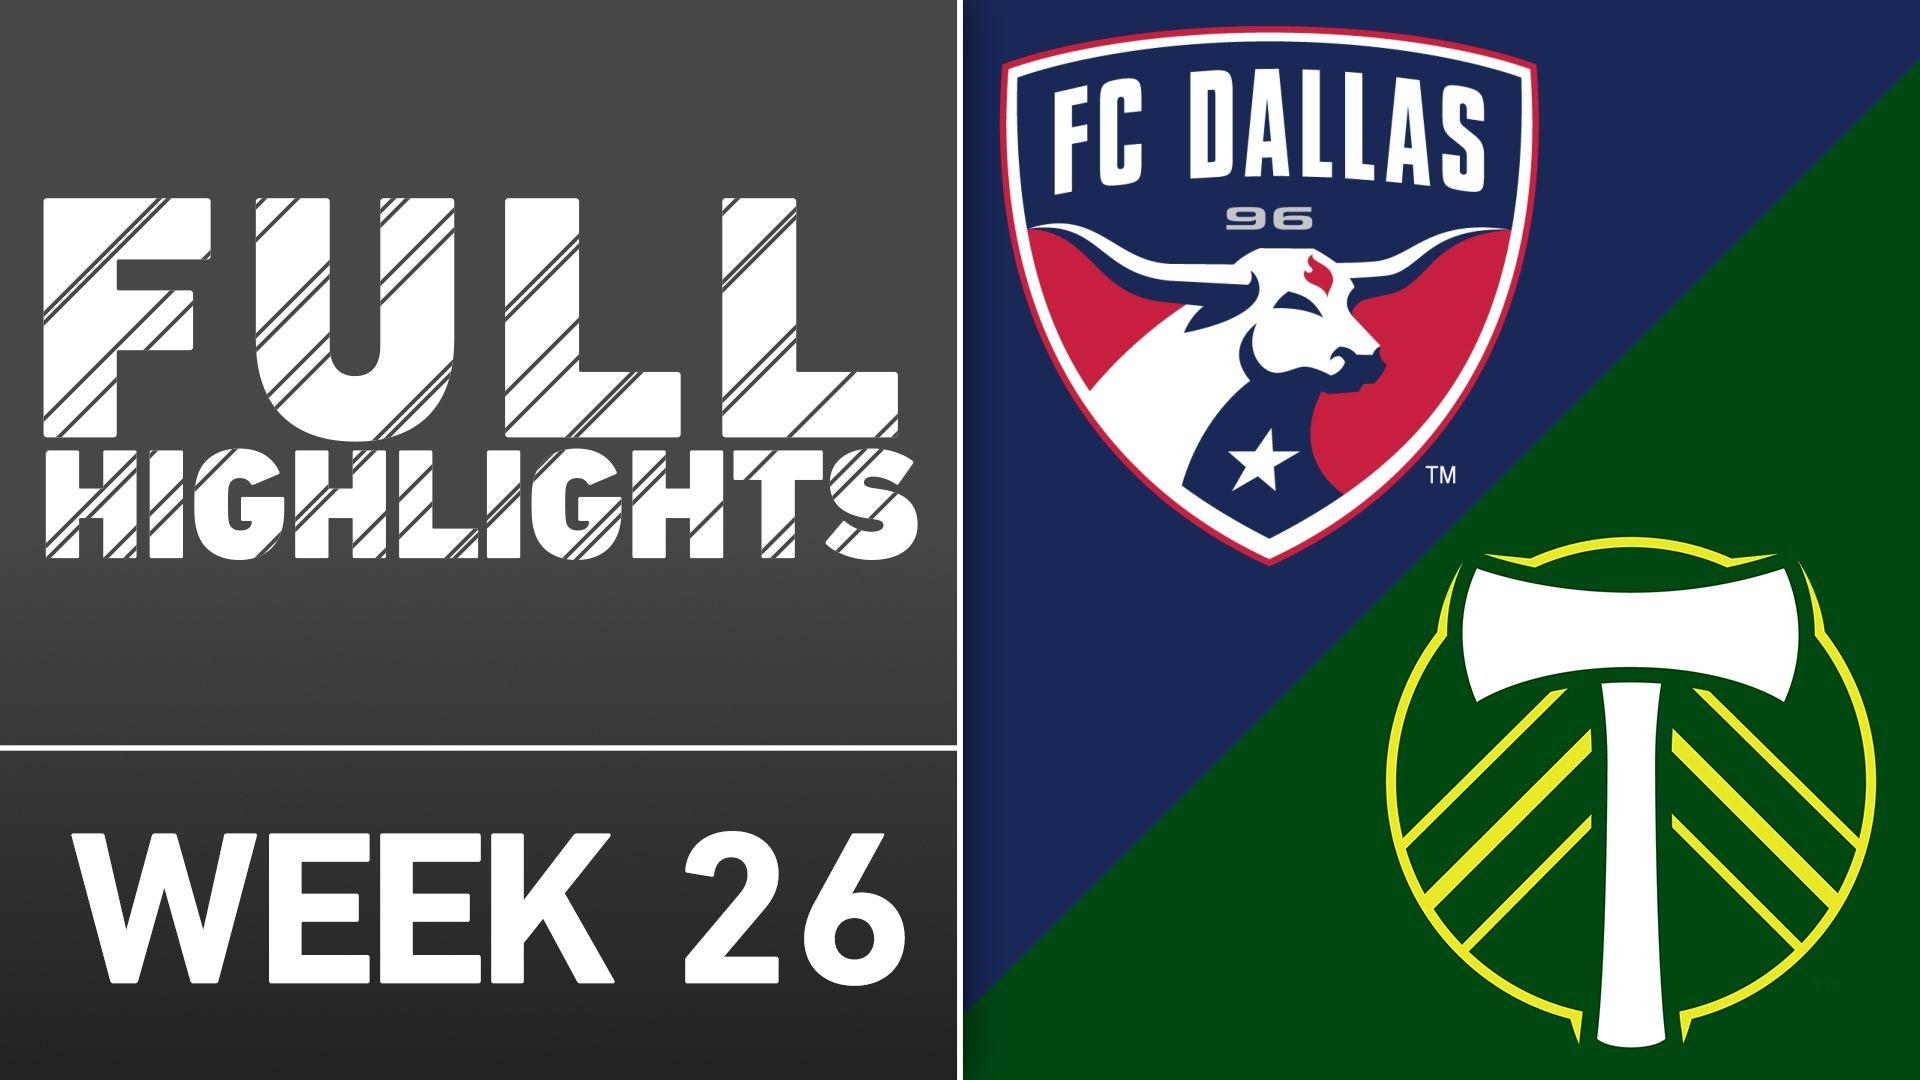 Video via MLS: FC Dallas 3-1 Portland